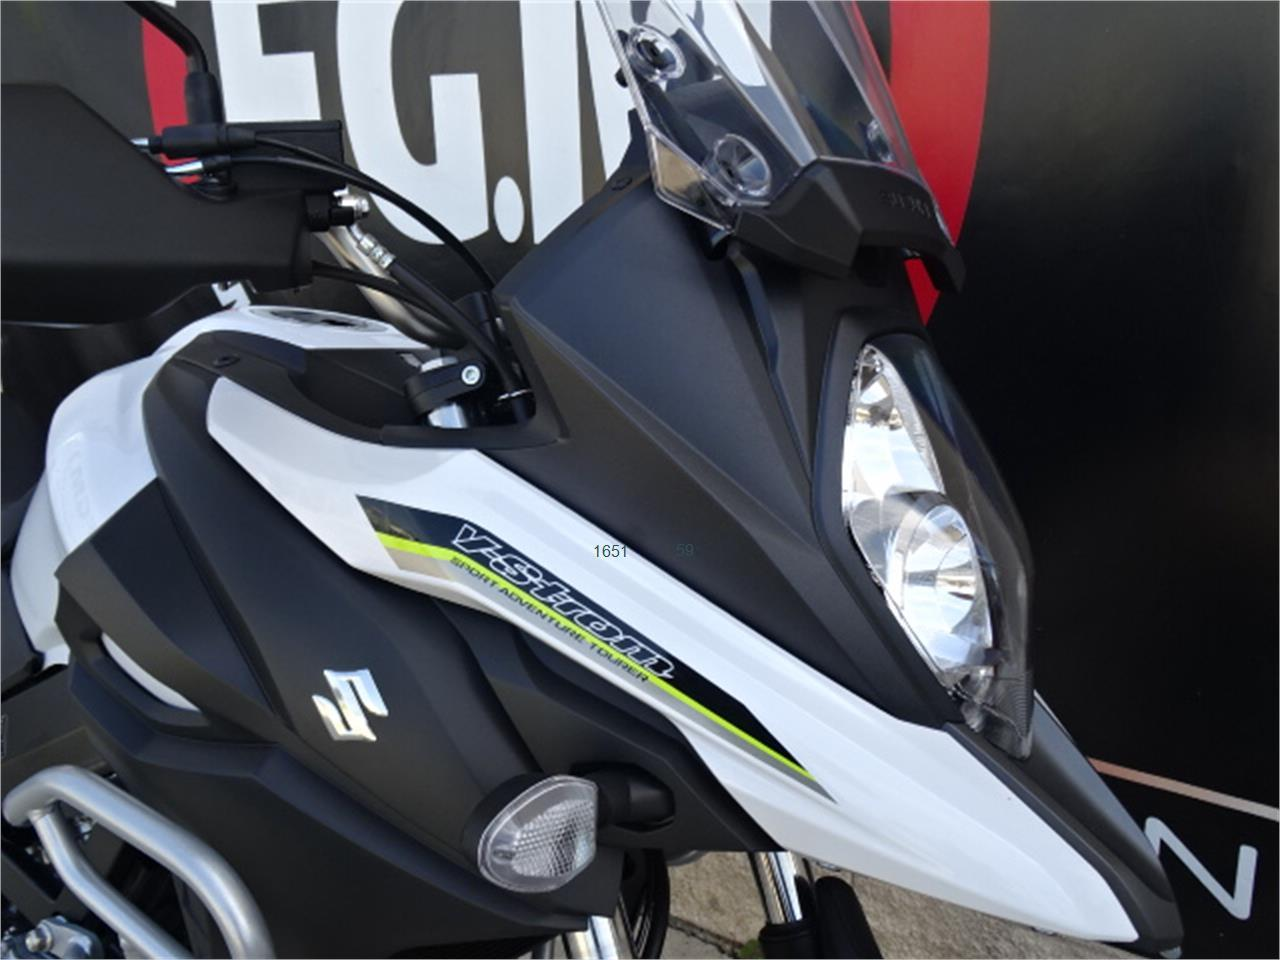 SUZUKI V-Strom 650 ABS_1 de venta en Madrid